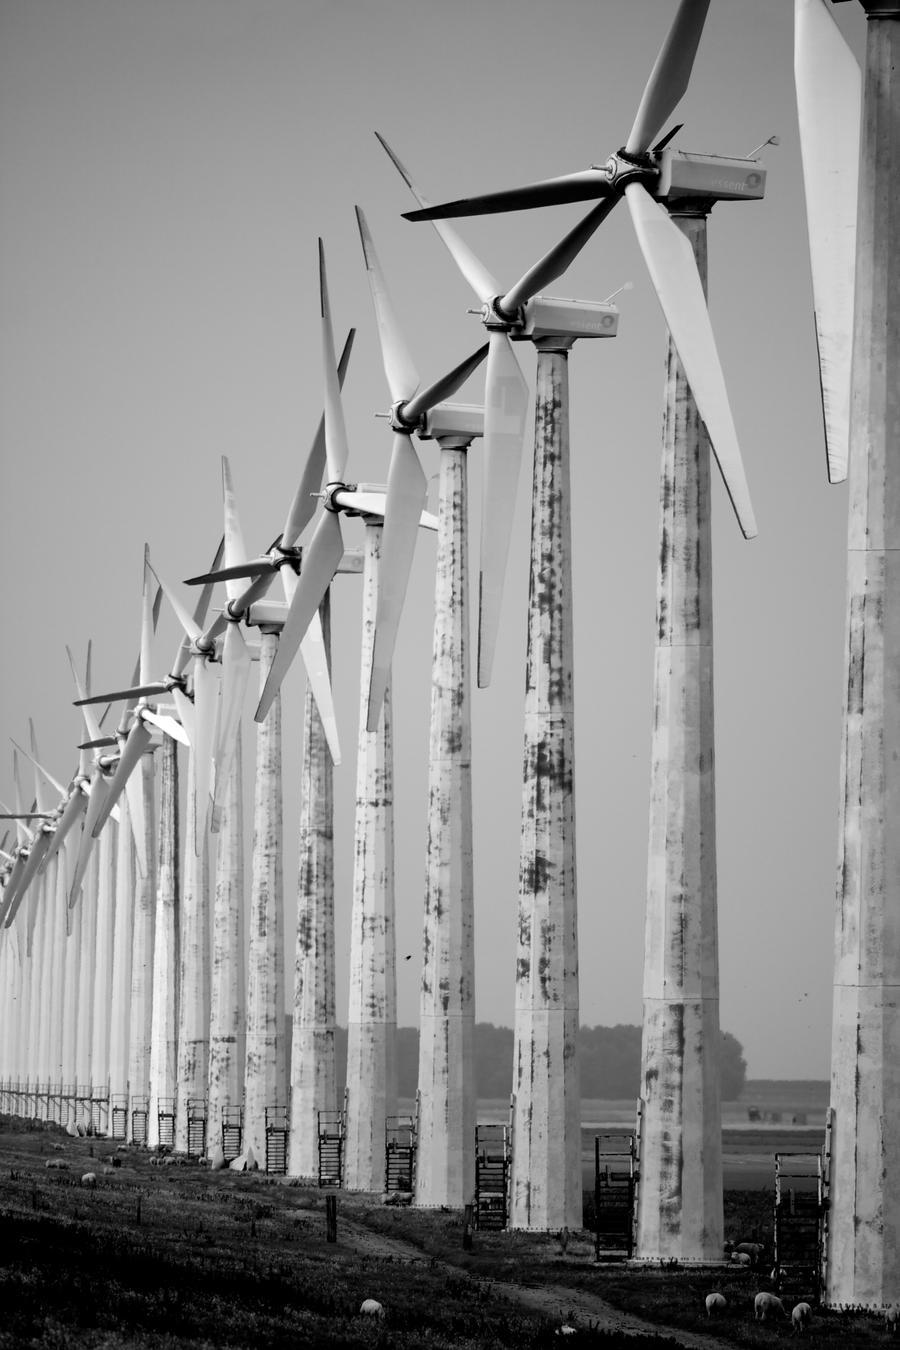 Wind farm by Intrepidity87